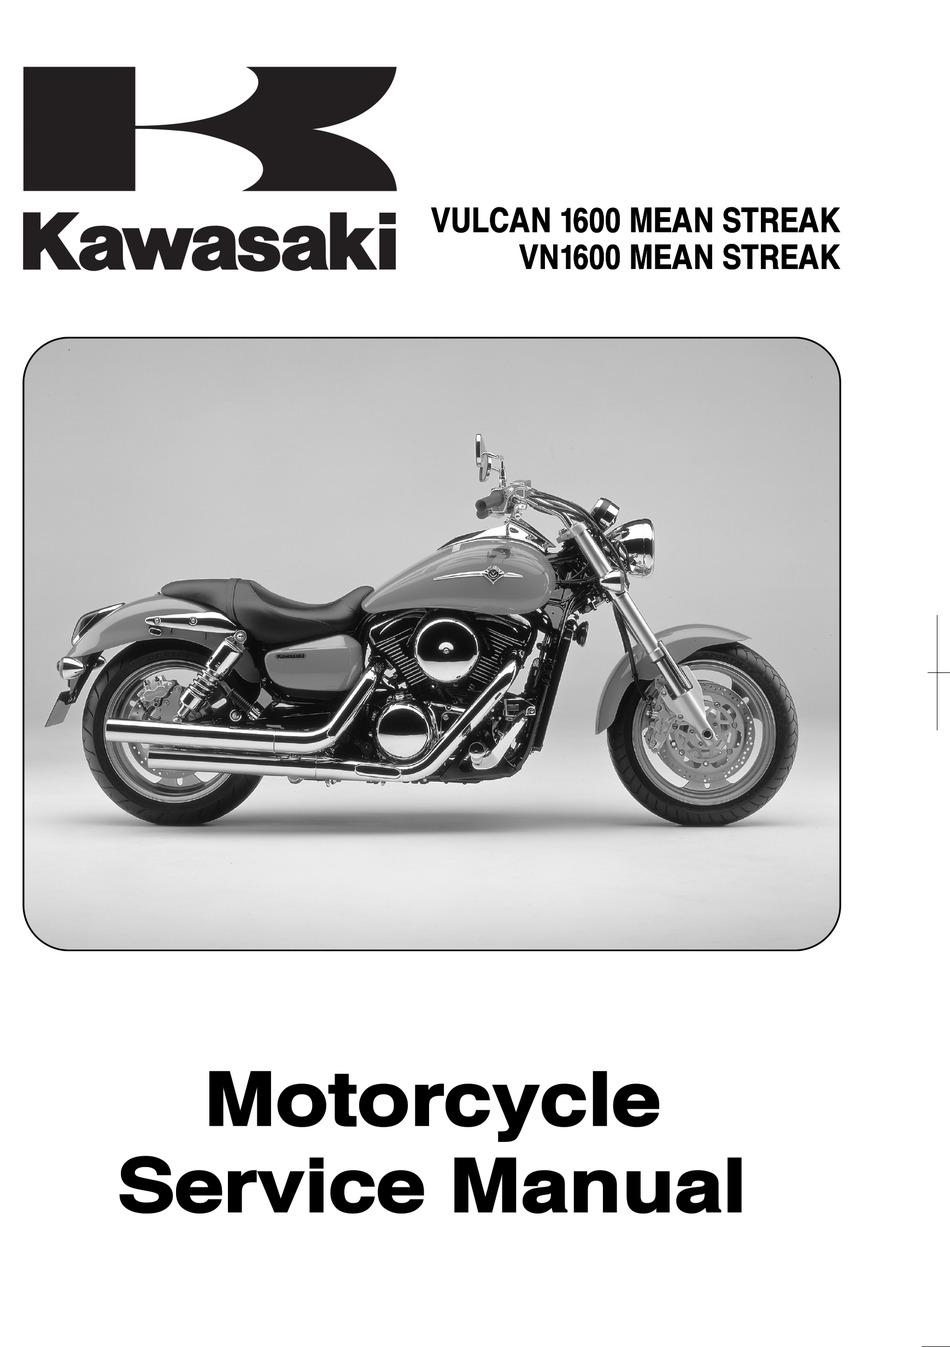 Voltage Regulator For Kawasaki VN 1600 Vulcan Mean Streak VN1600 2004 2005 2006